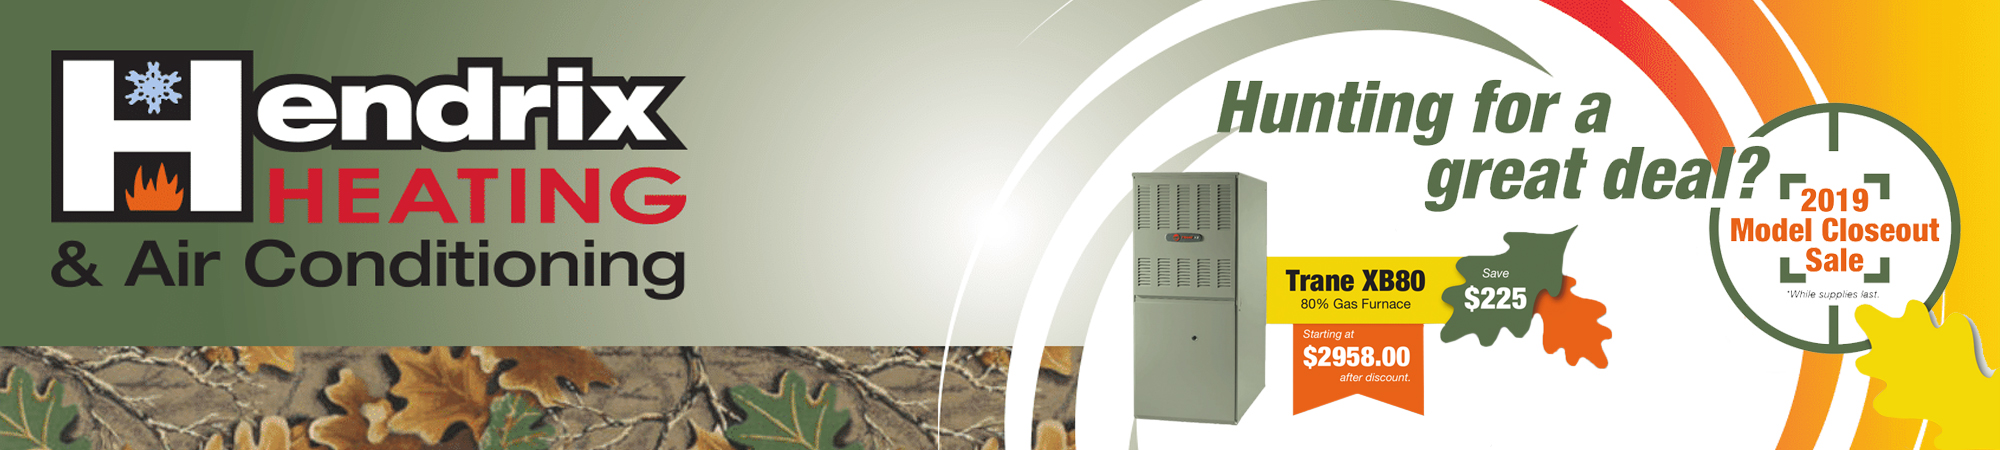 Furnace Repair Corvallis OR | Hendrix Heating & Air Conditioning